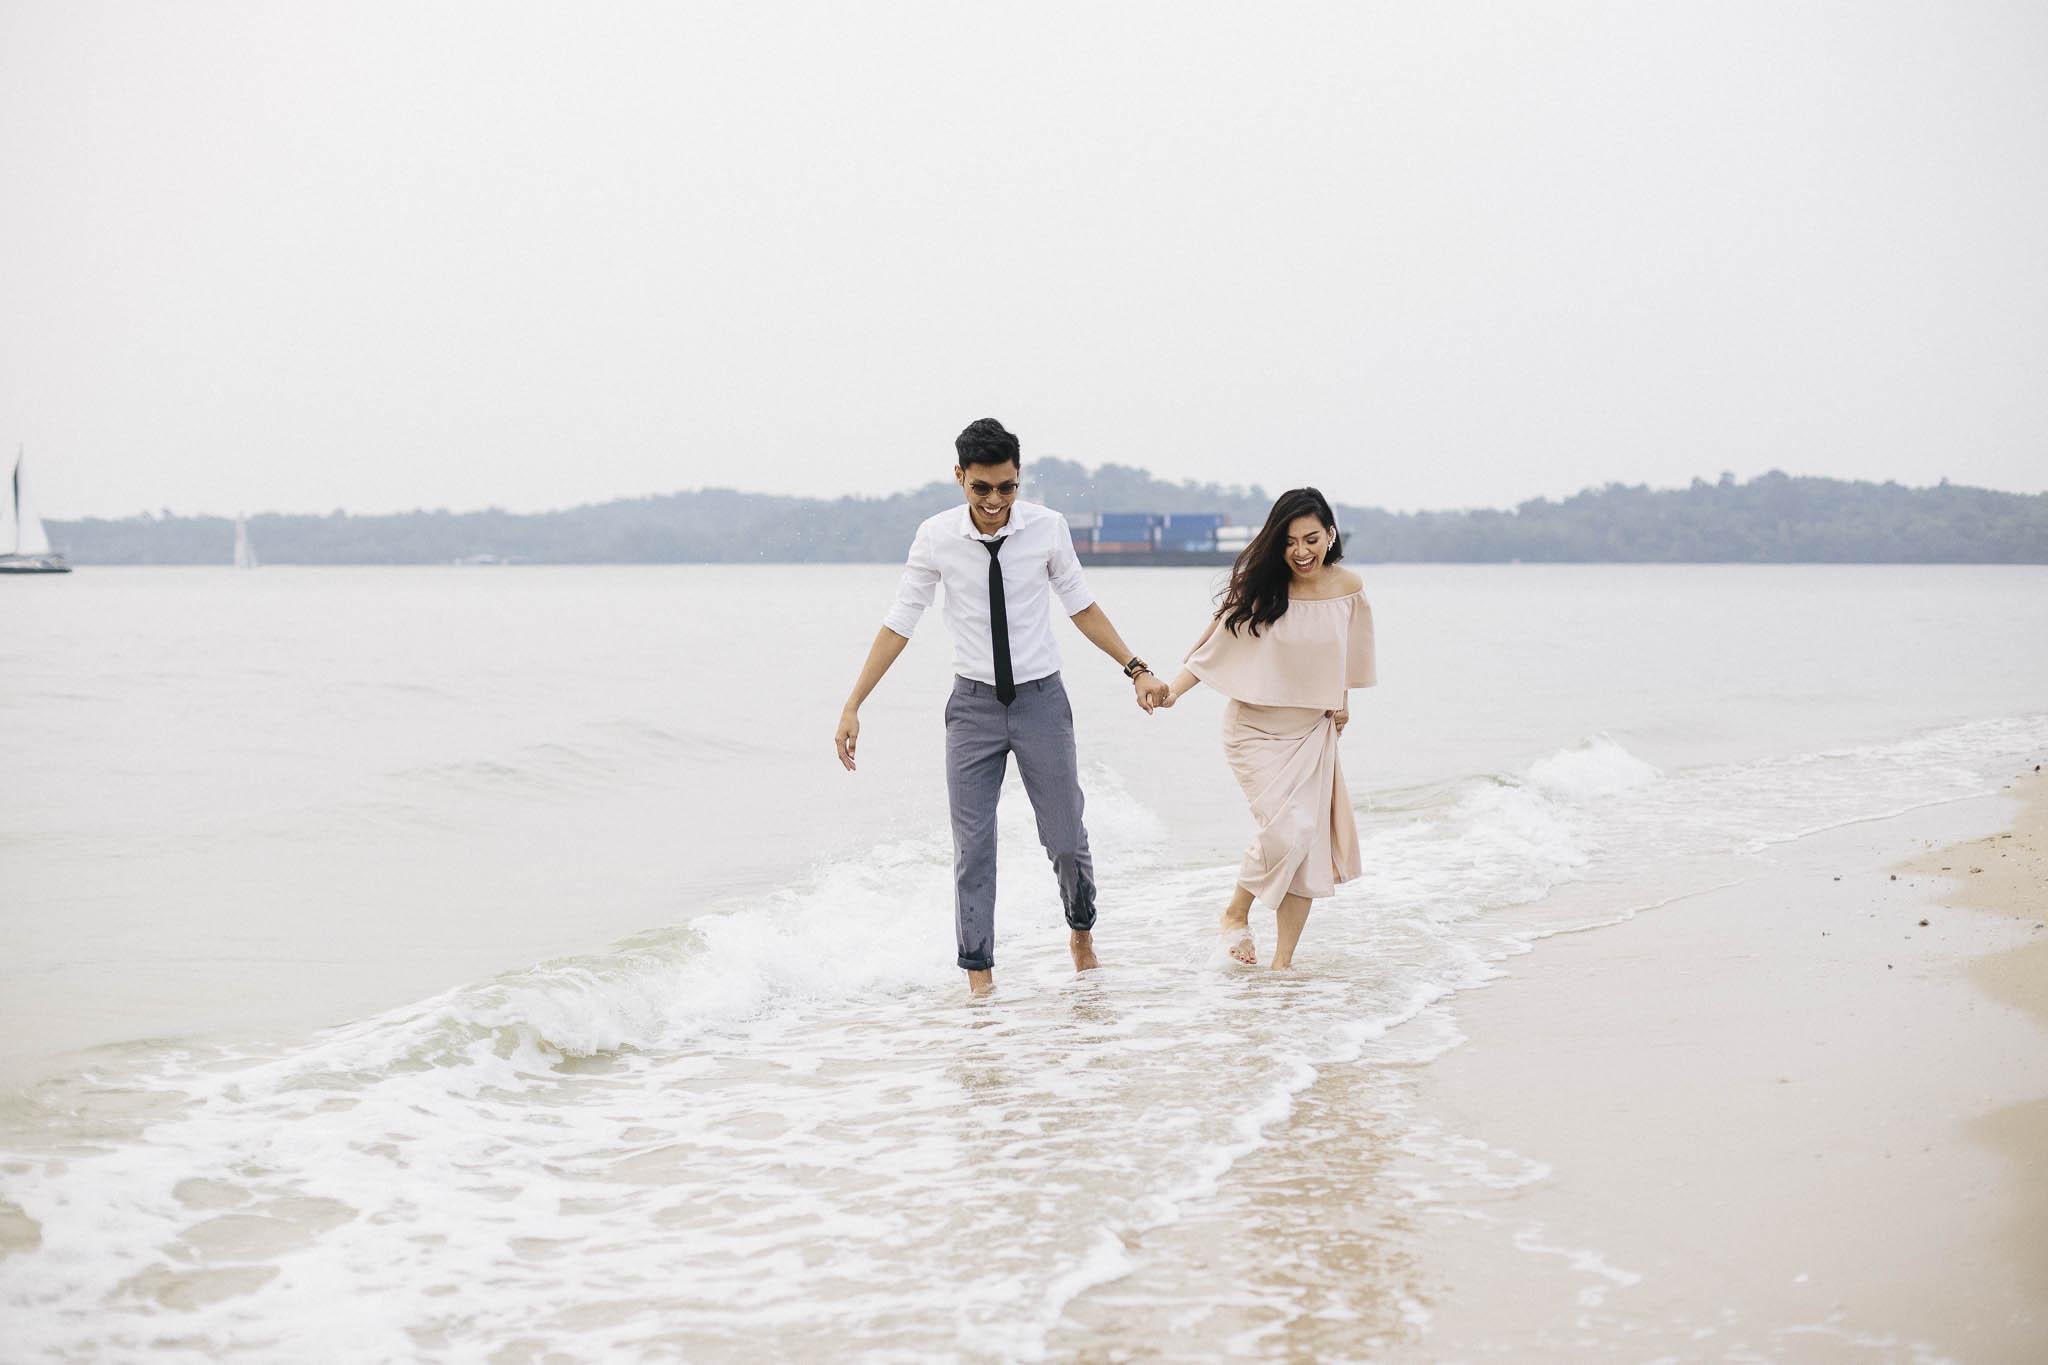 singapore-wedding-photographer-malay-travel-adli-tashah-32.jpg